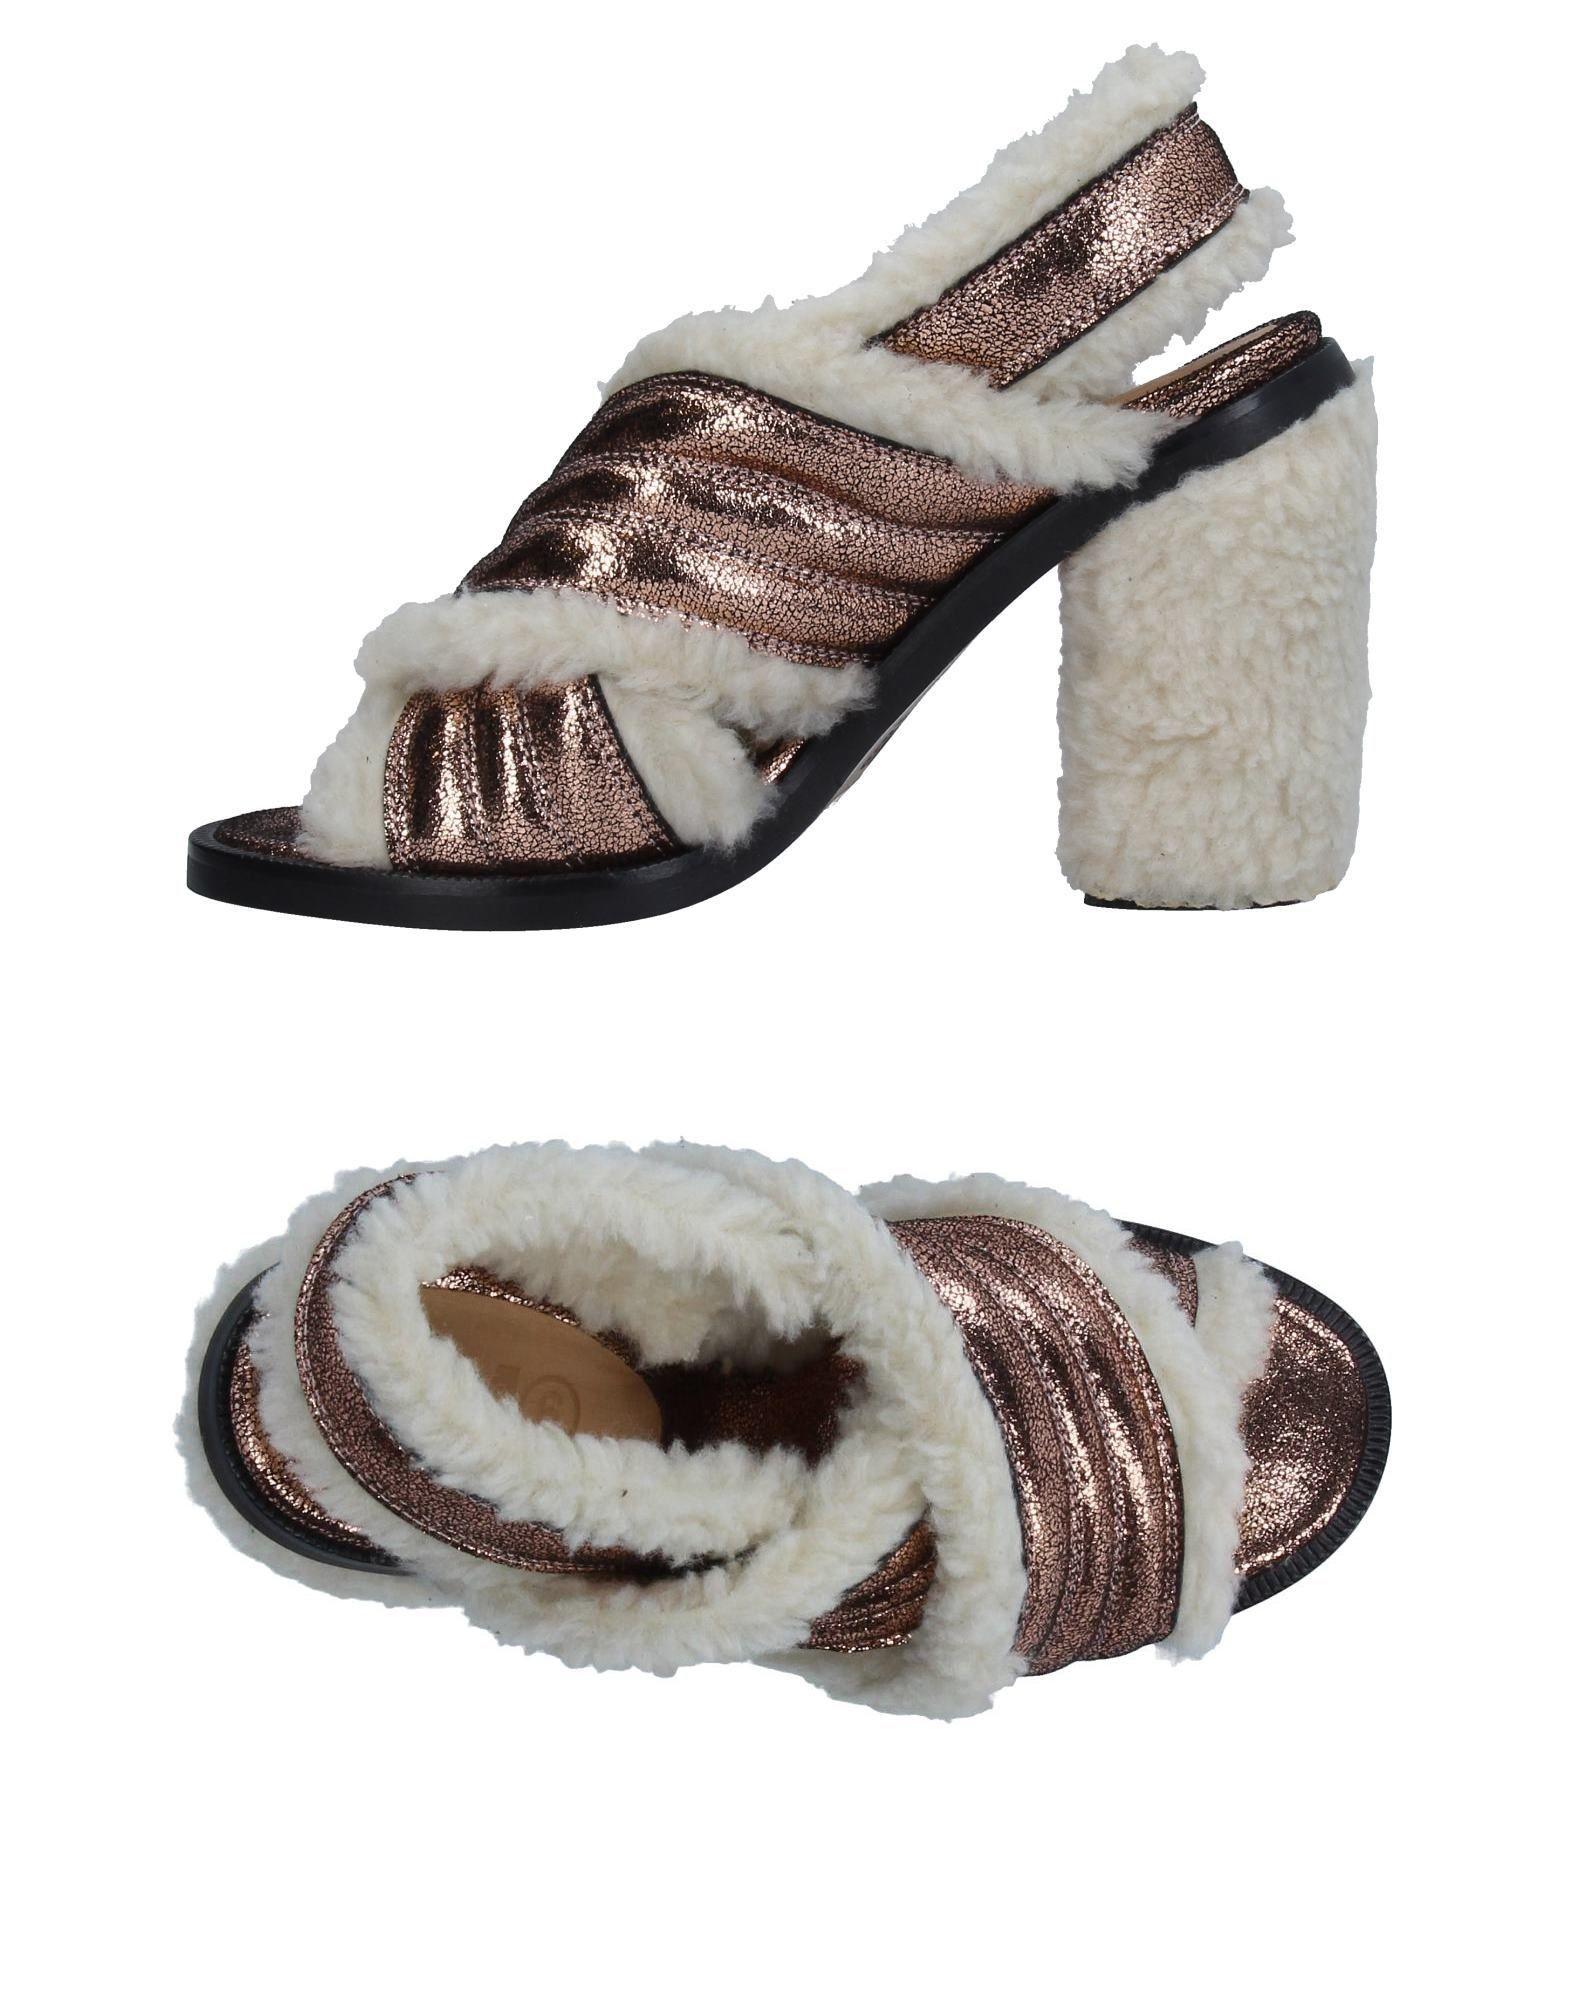 Mm6 Maison Margiela Sandalen Damen Schuhe  11334569EXGut aussehende strapazierfähige Schuhe Damen 6cc80d